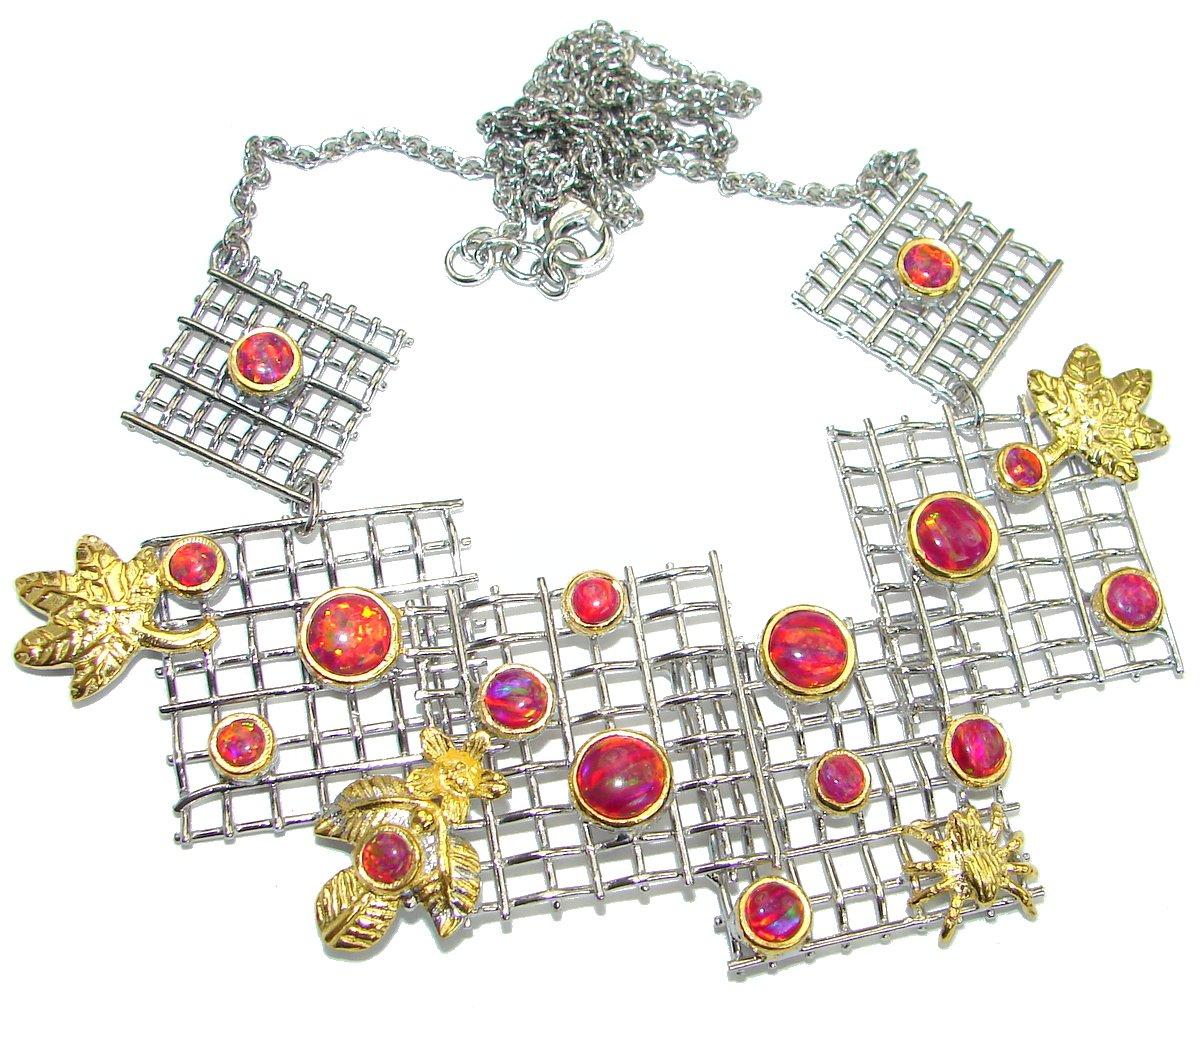 SilverFury Fire Opal Women 925 Sterling Silver Necklace - FREE GIFT BOX